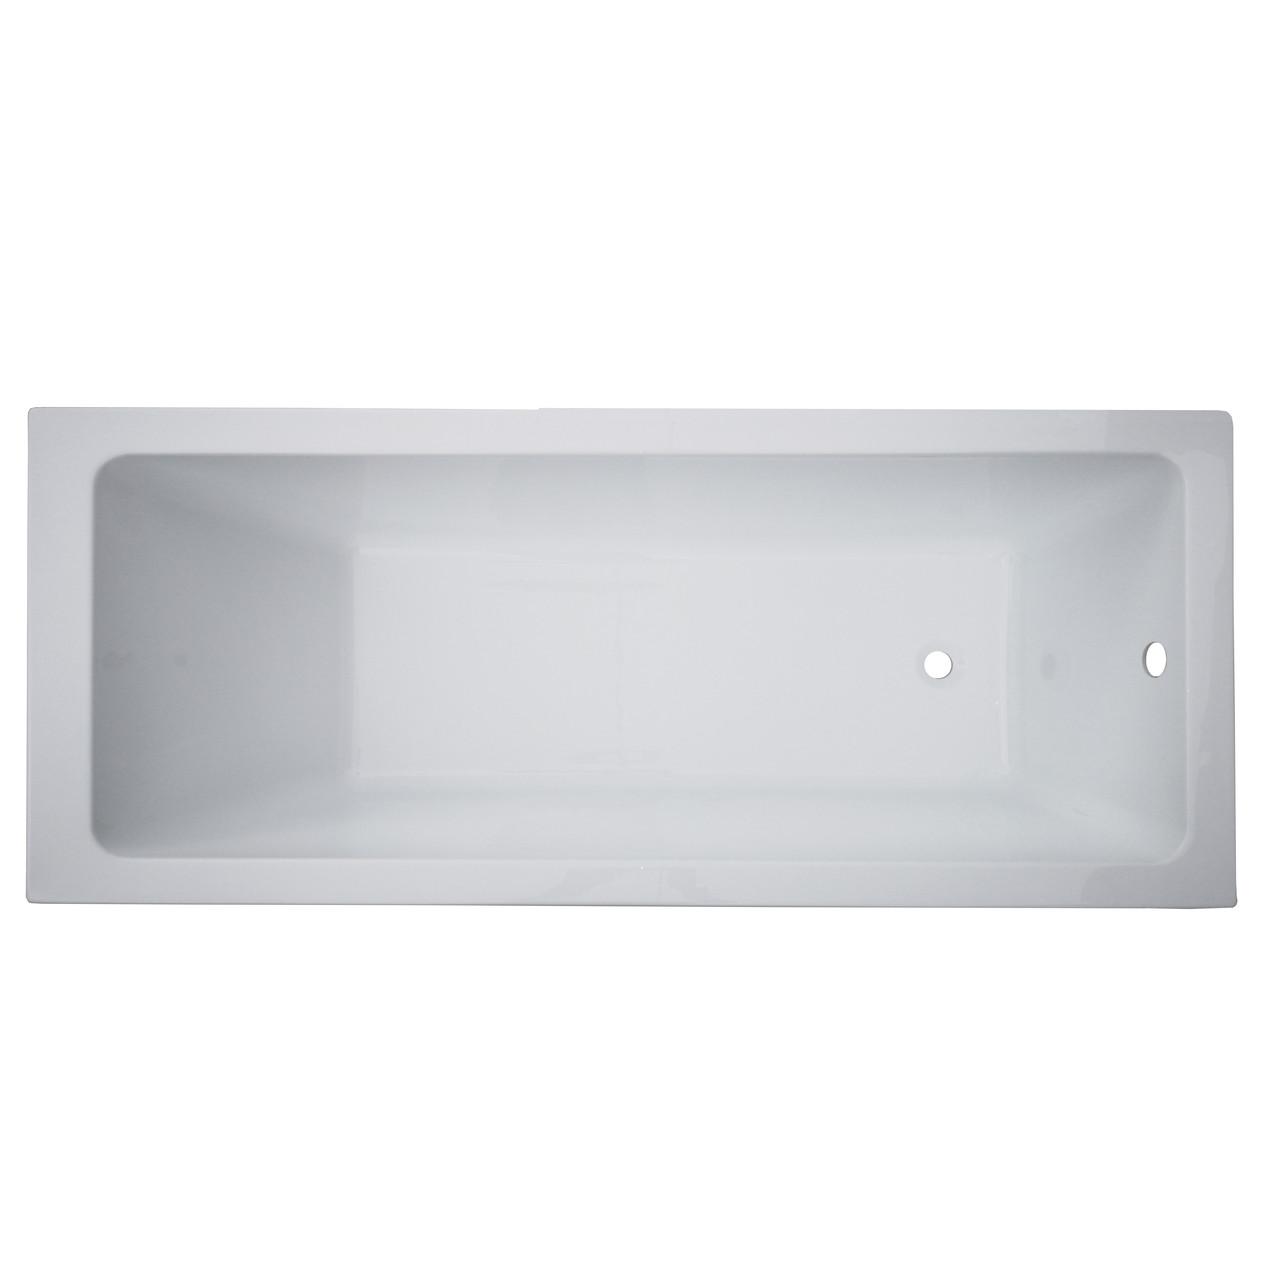 LIBRA ванна 170*70*45,8см без ножек, акрил 5мм